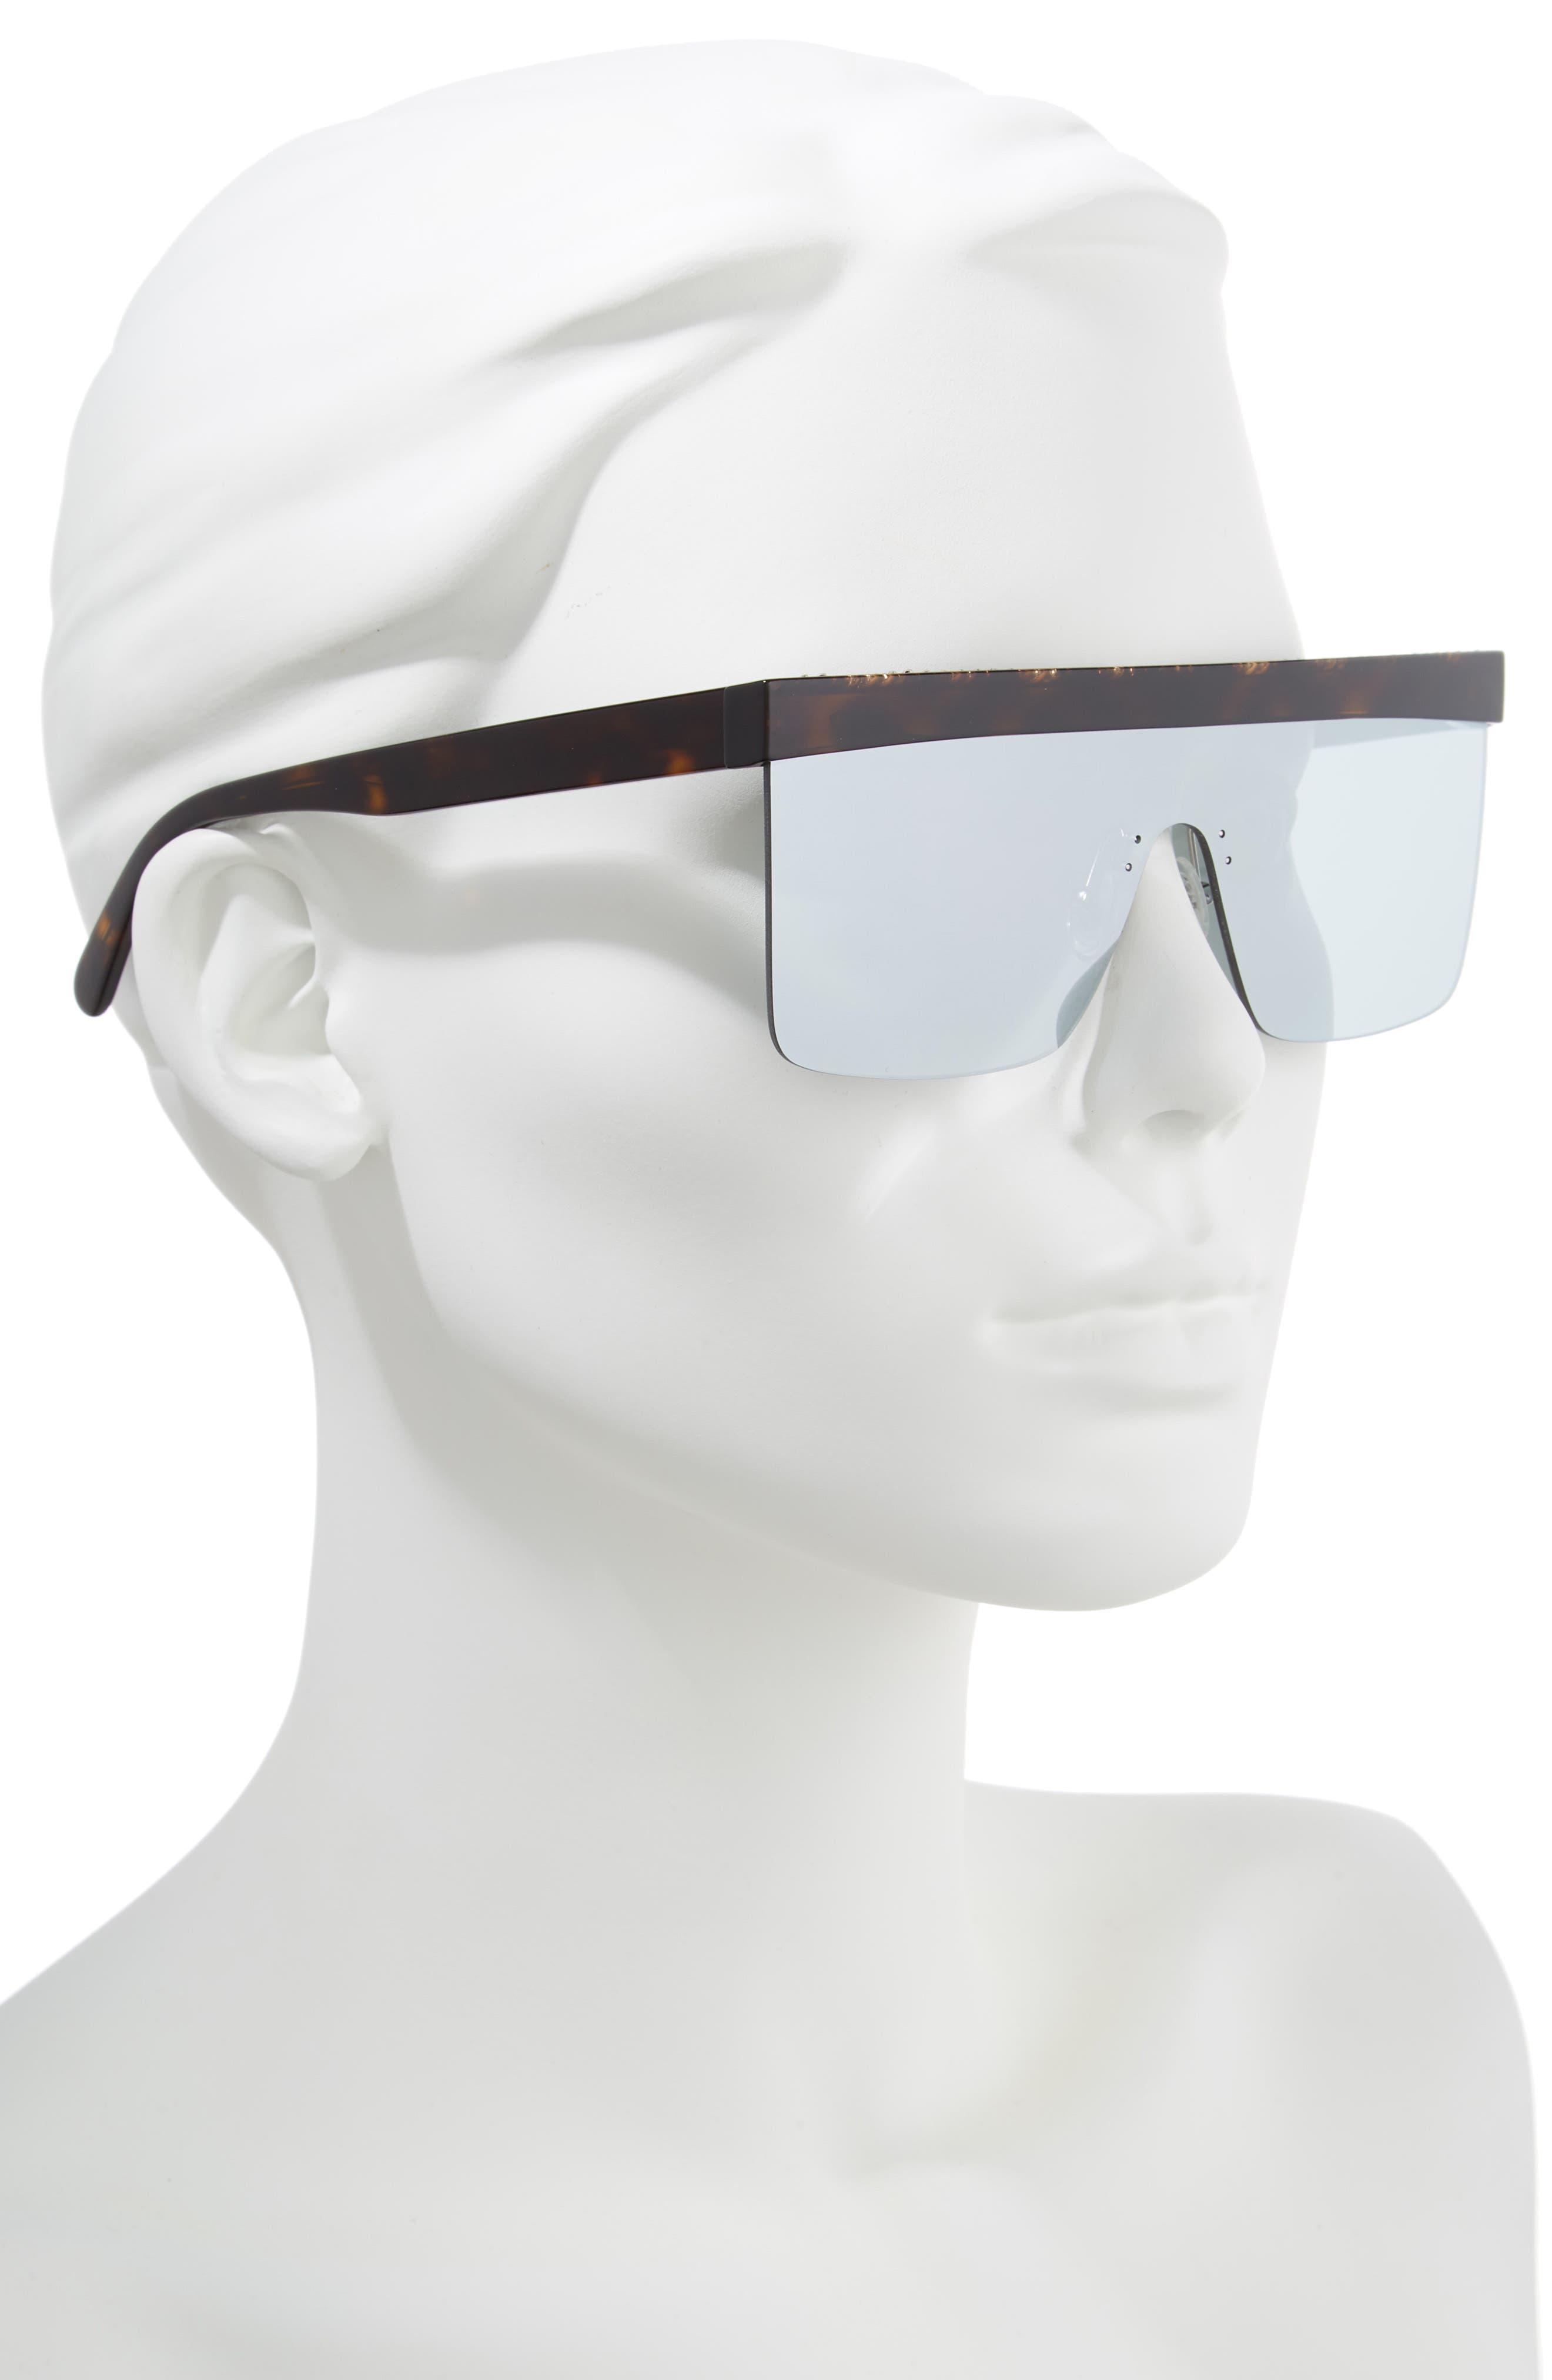 99mm Shield Sunglasses,                             Alternate thumbnail 2, color,                             Shiny Dark Havana